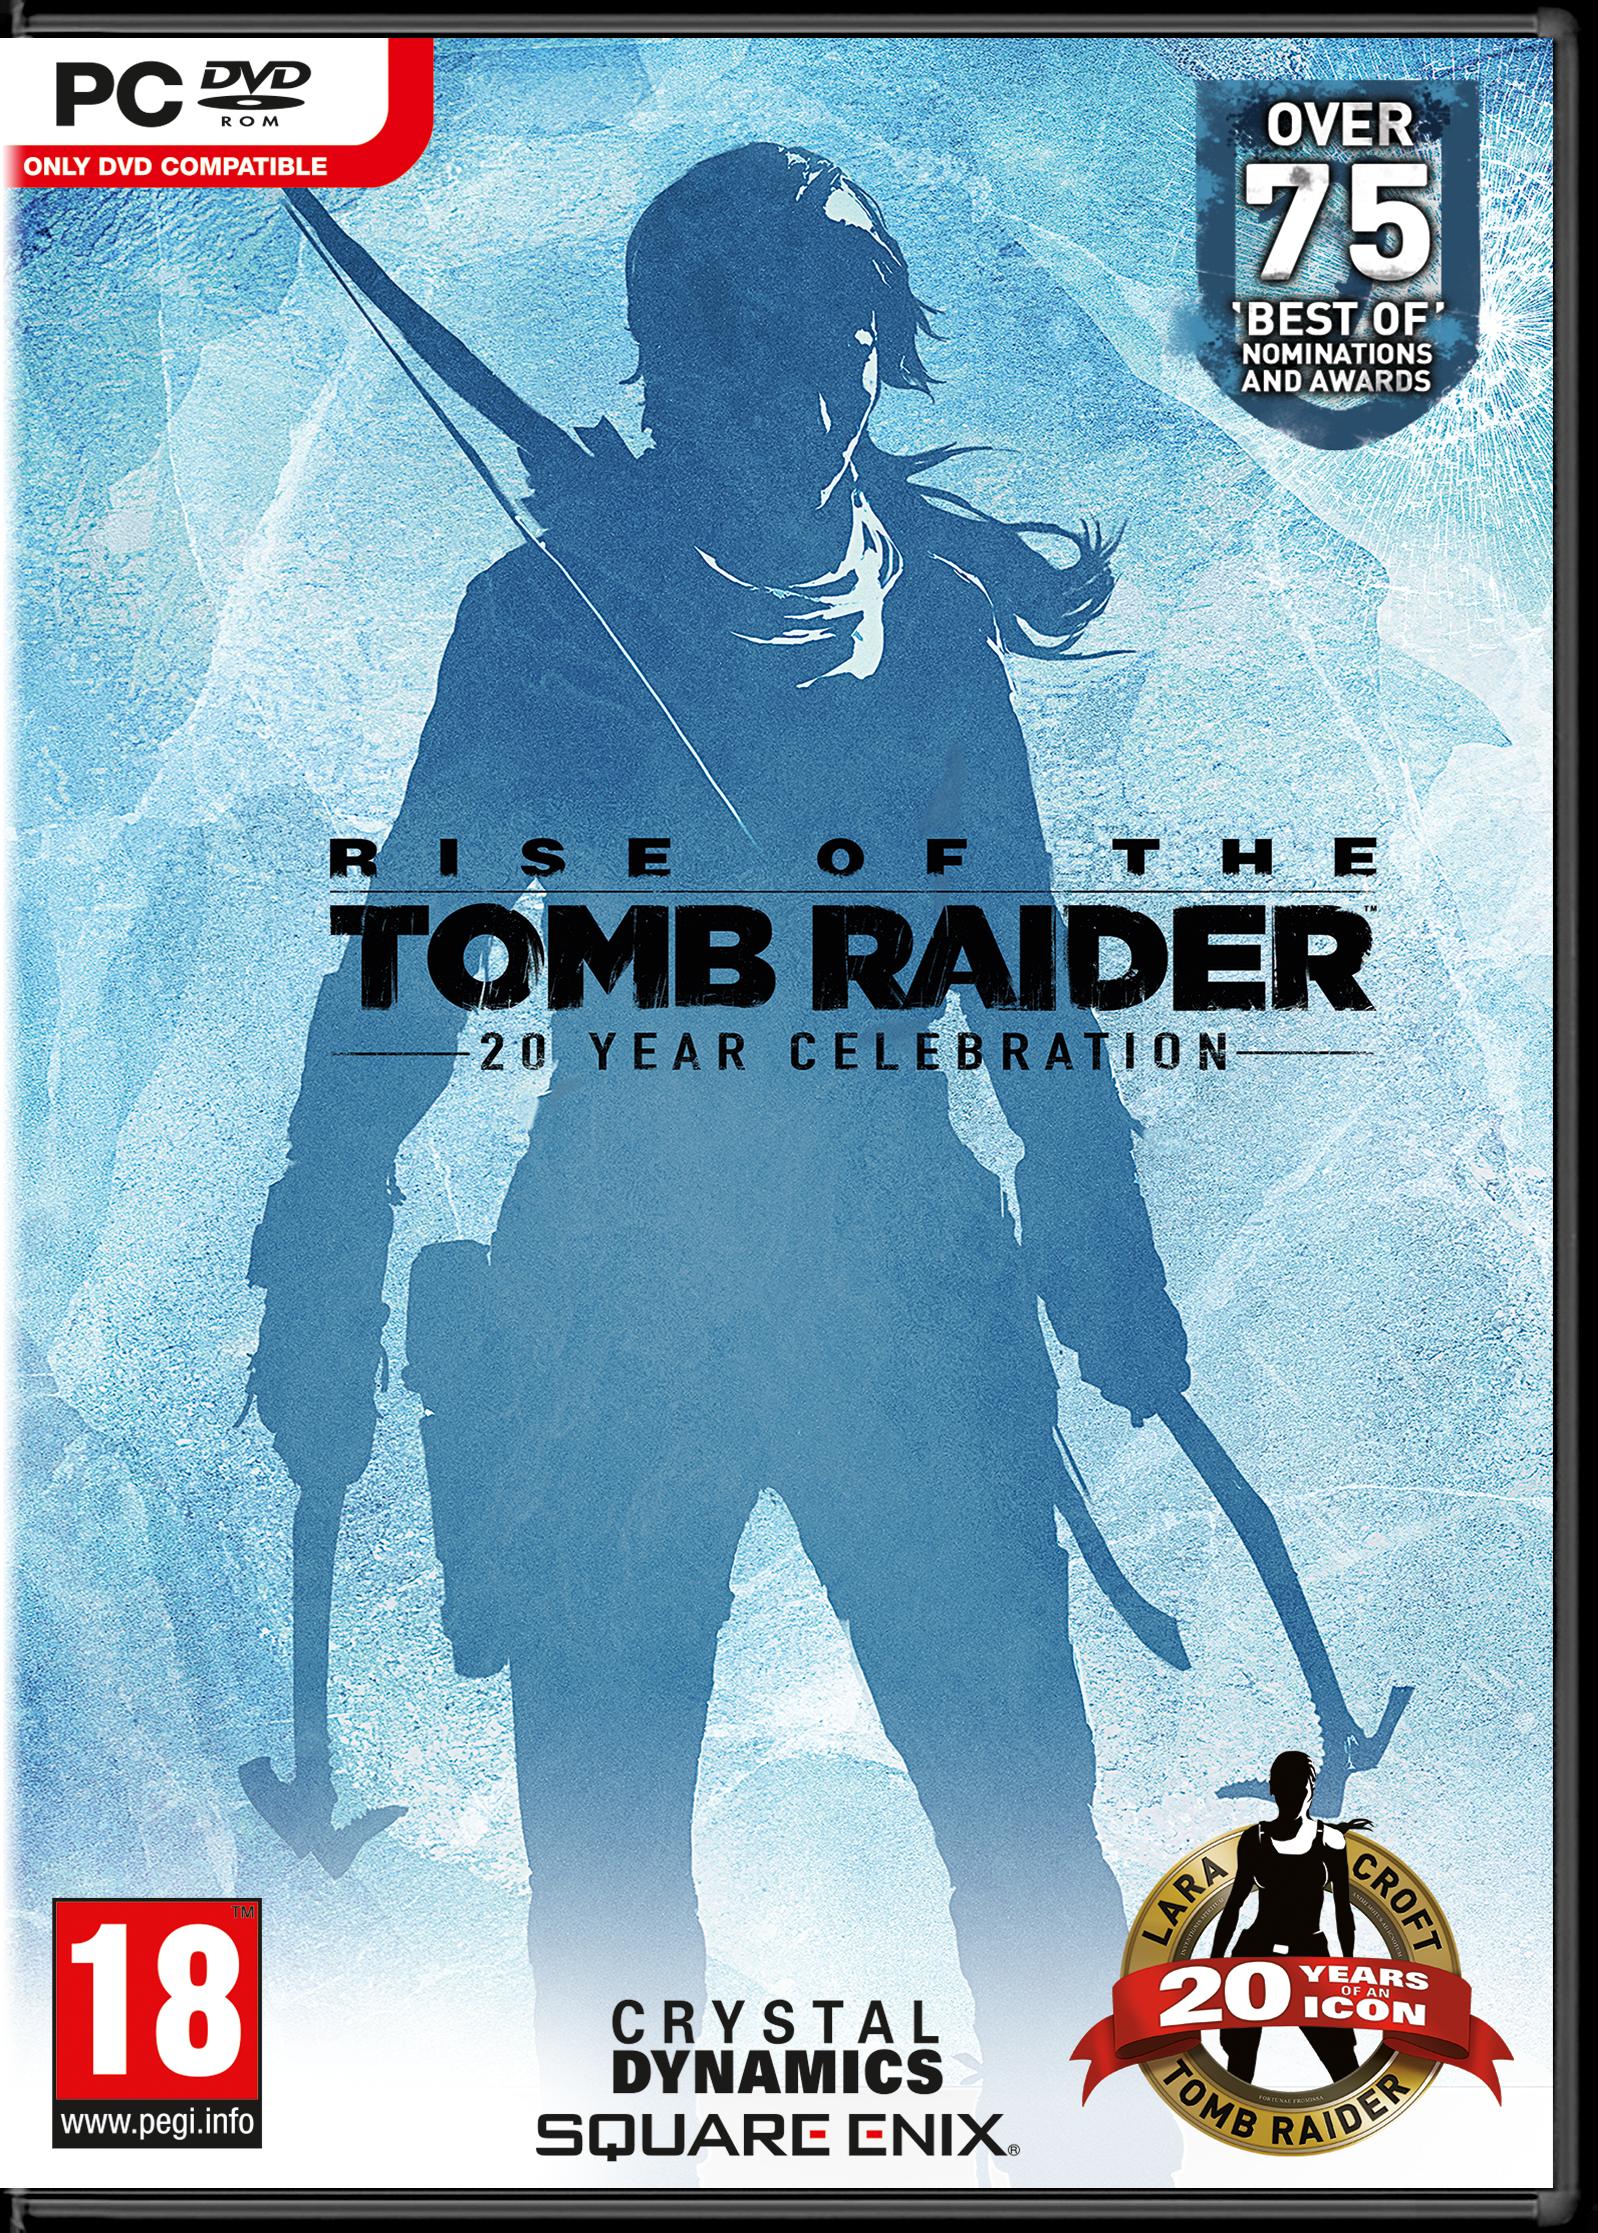 Kop Rise Of The Tomb Raider 20 Year Celebration